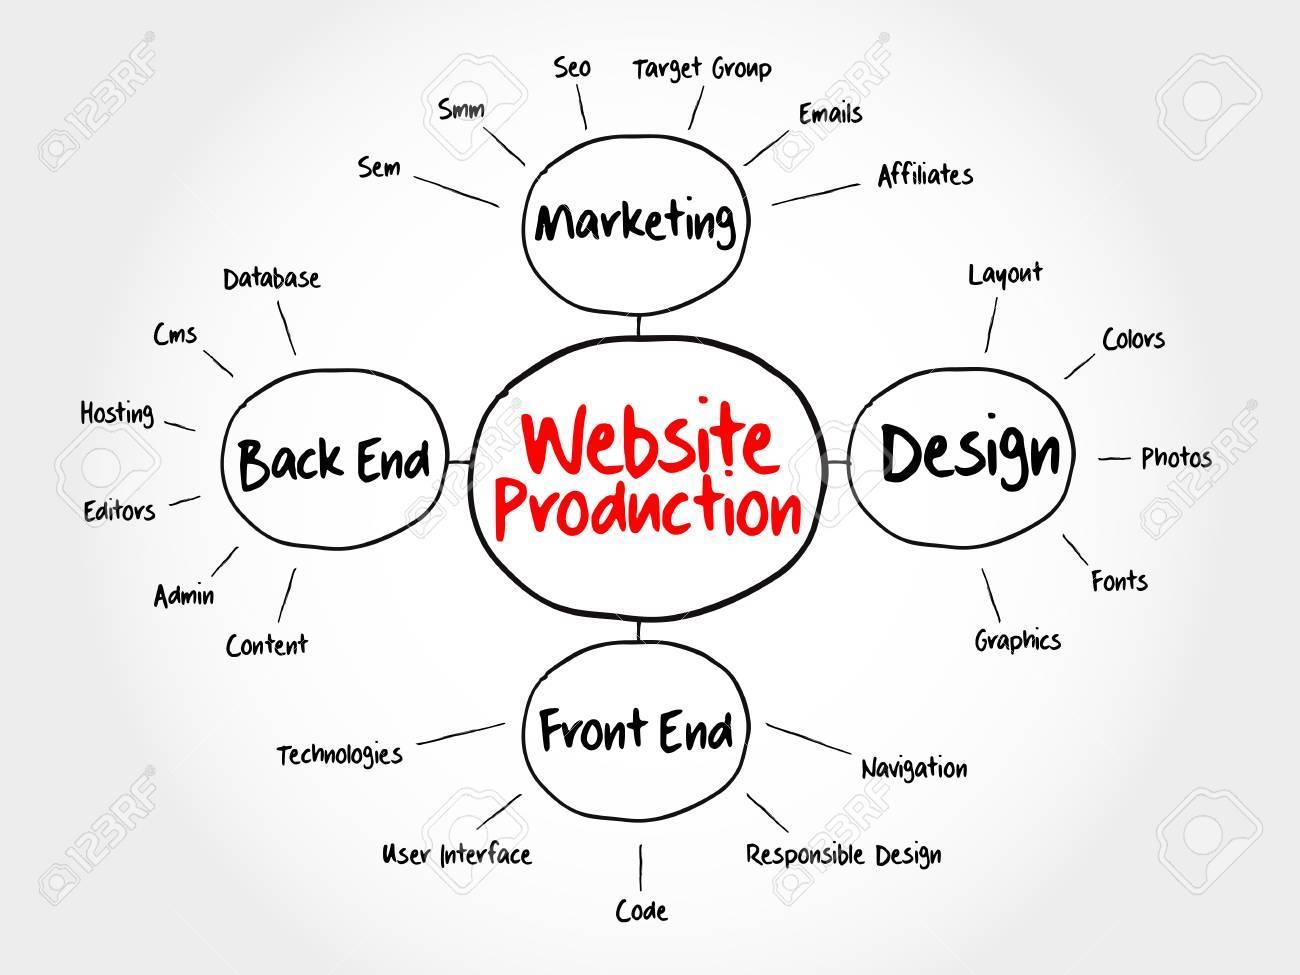 Website production mind map flowchart business concept for website production mind map flowchart business concept for presentations and reports stock vector 54971861 nvjuhfo Images